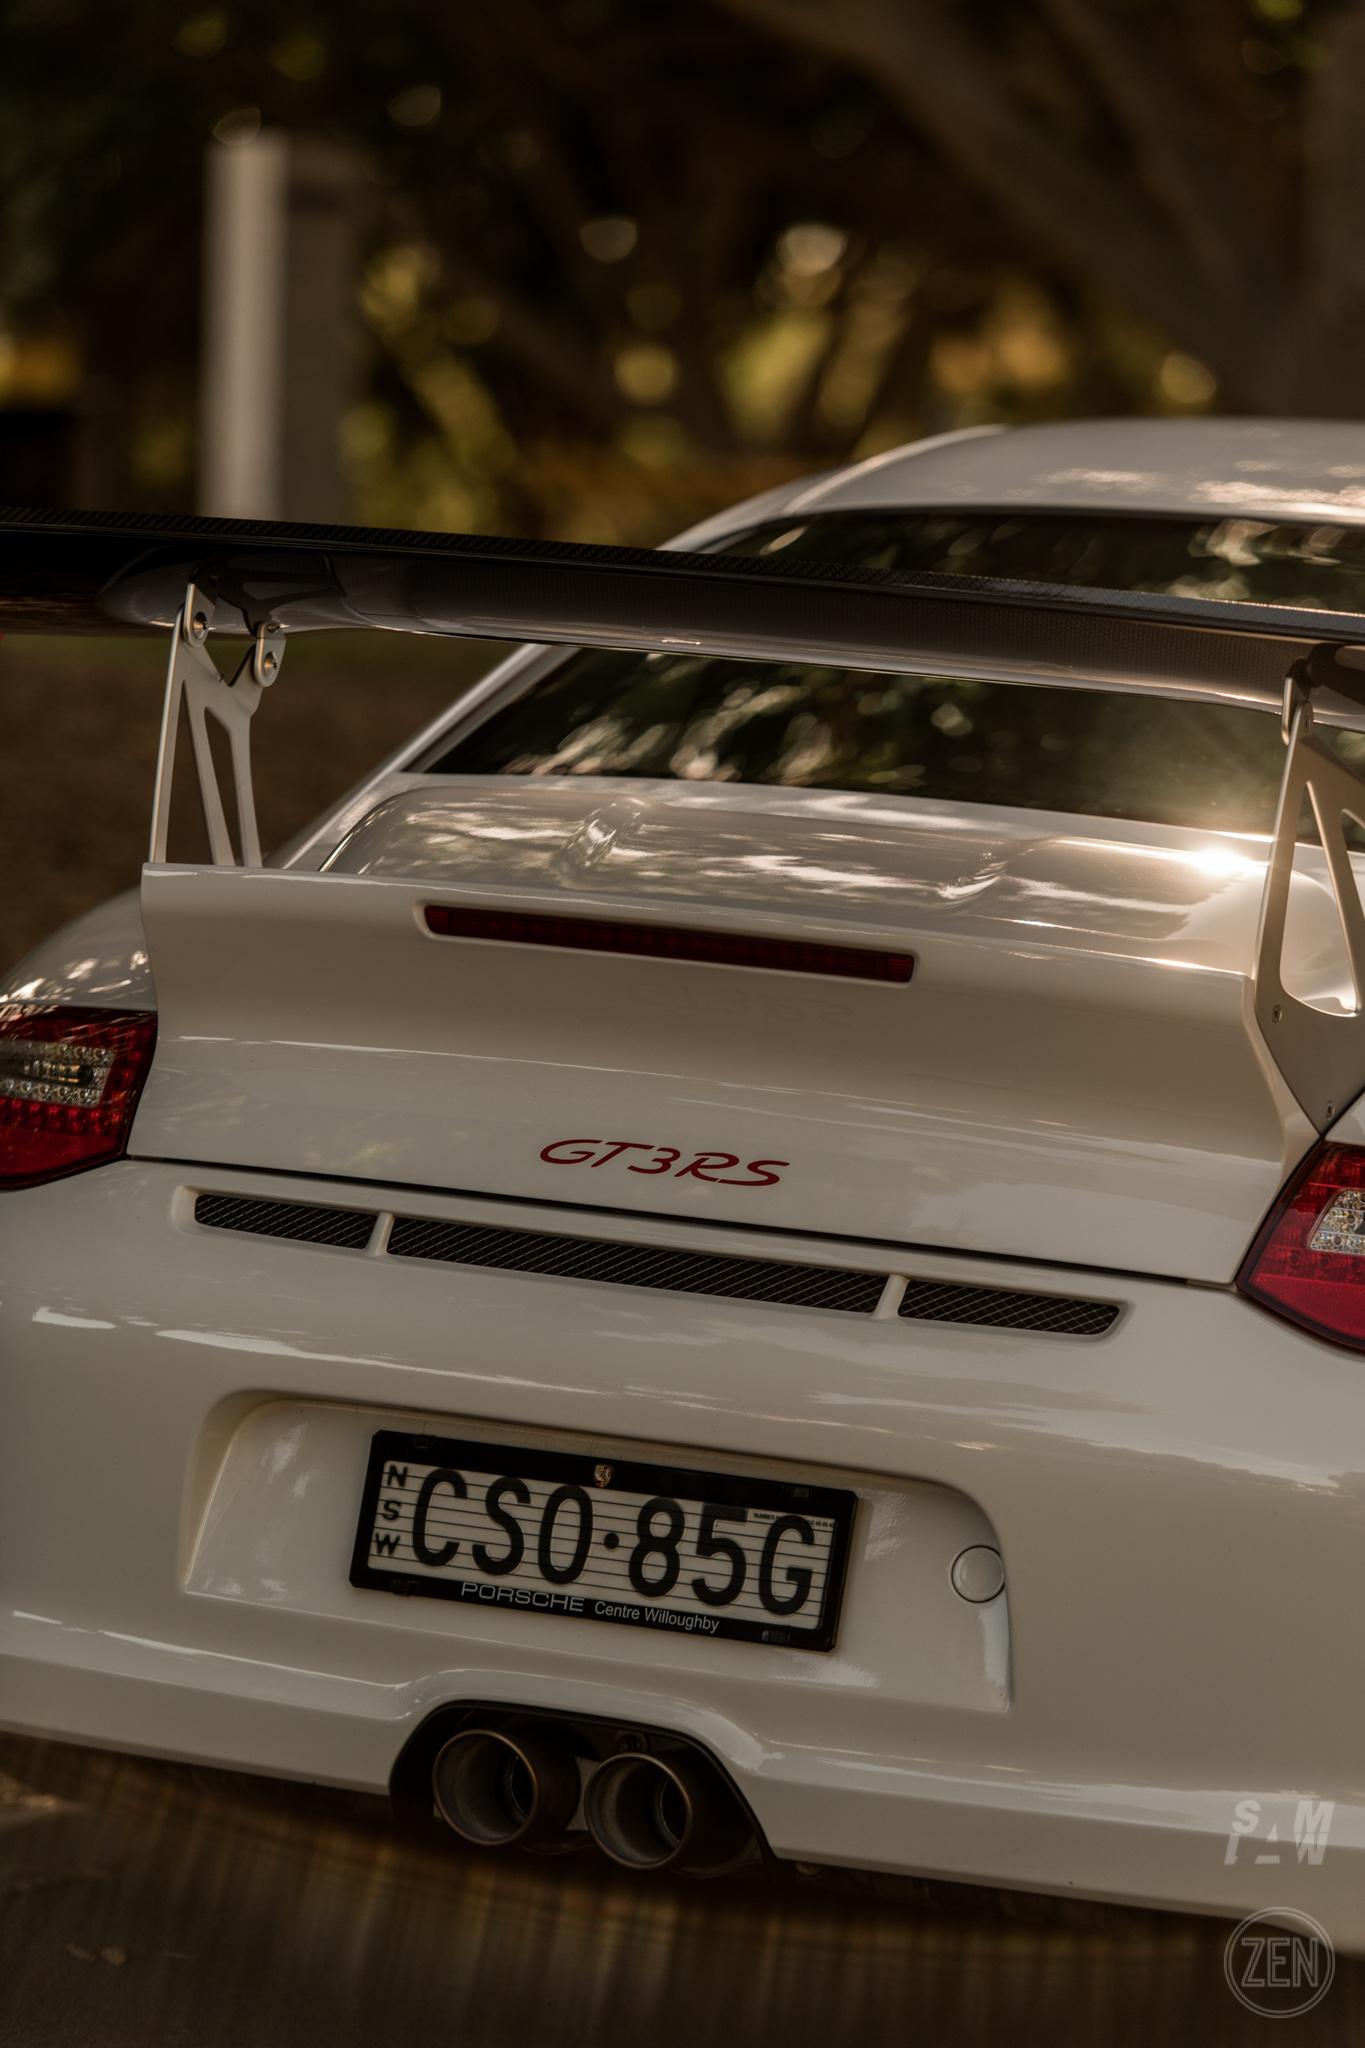 2019-10-27 - Autohaus Porsches & Coffee 118